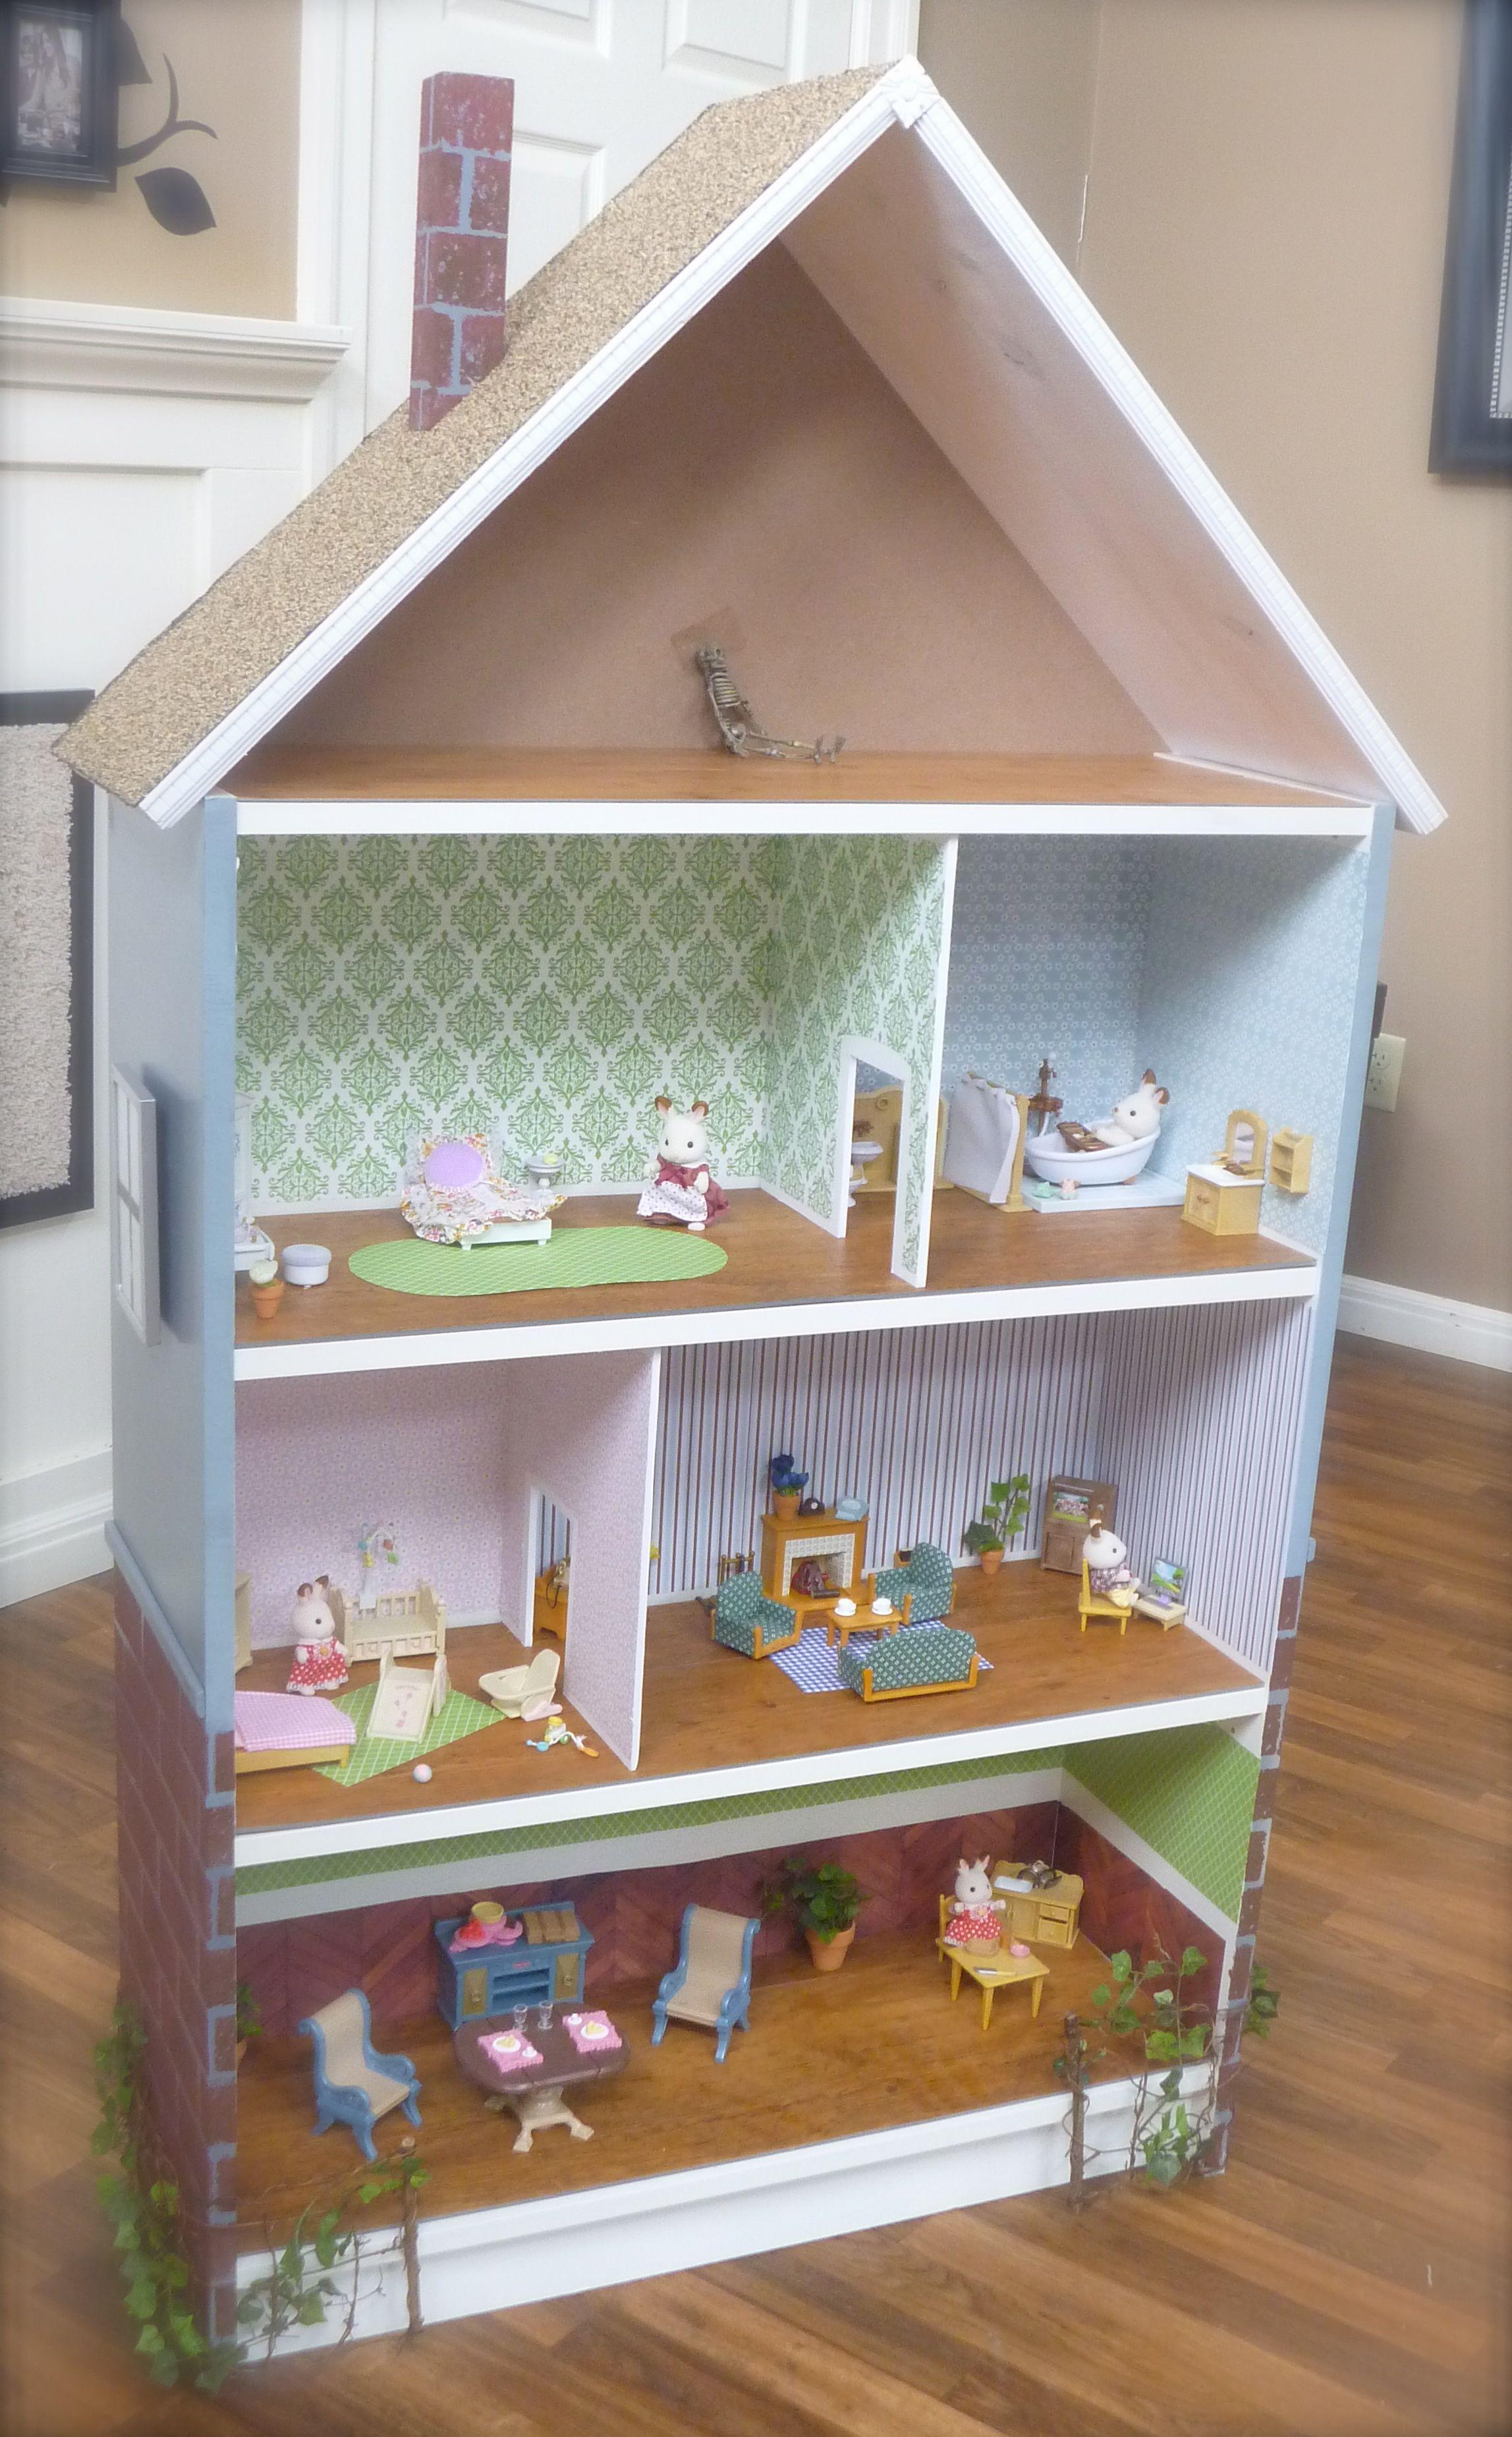 dollhouse bookcase brick house hero p1060236 ORYYCGV